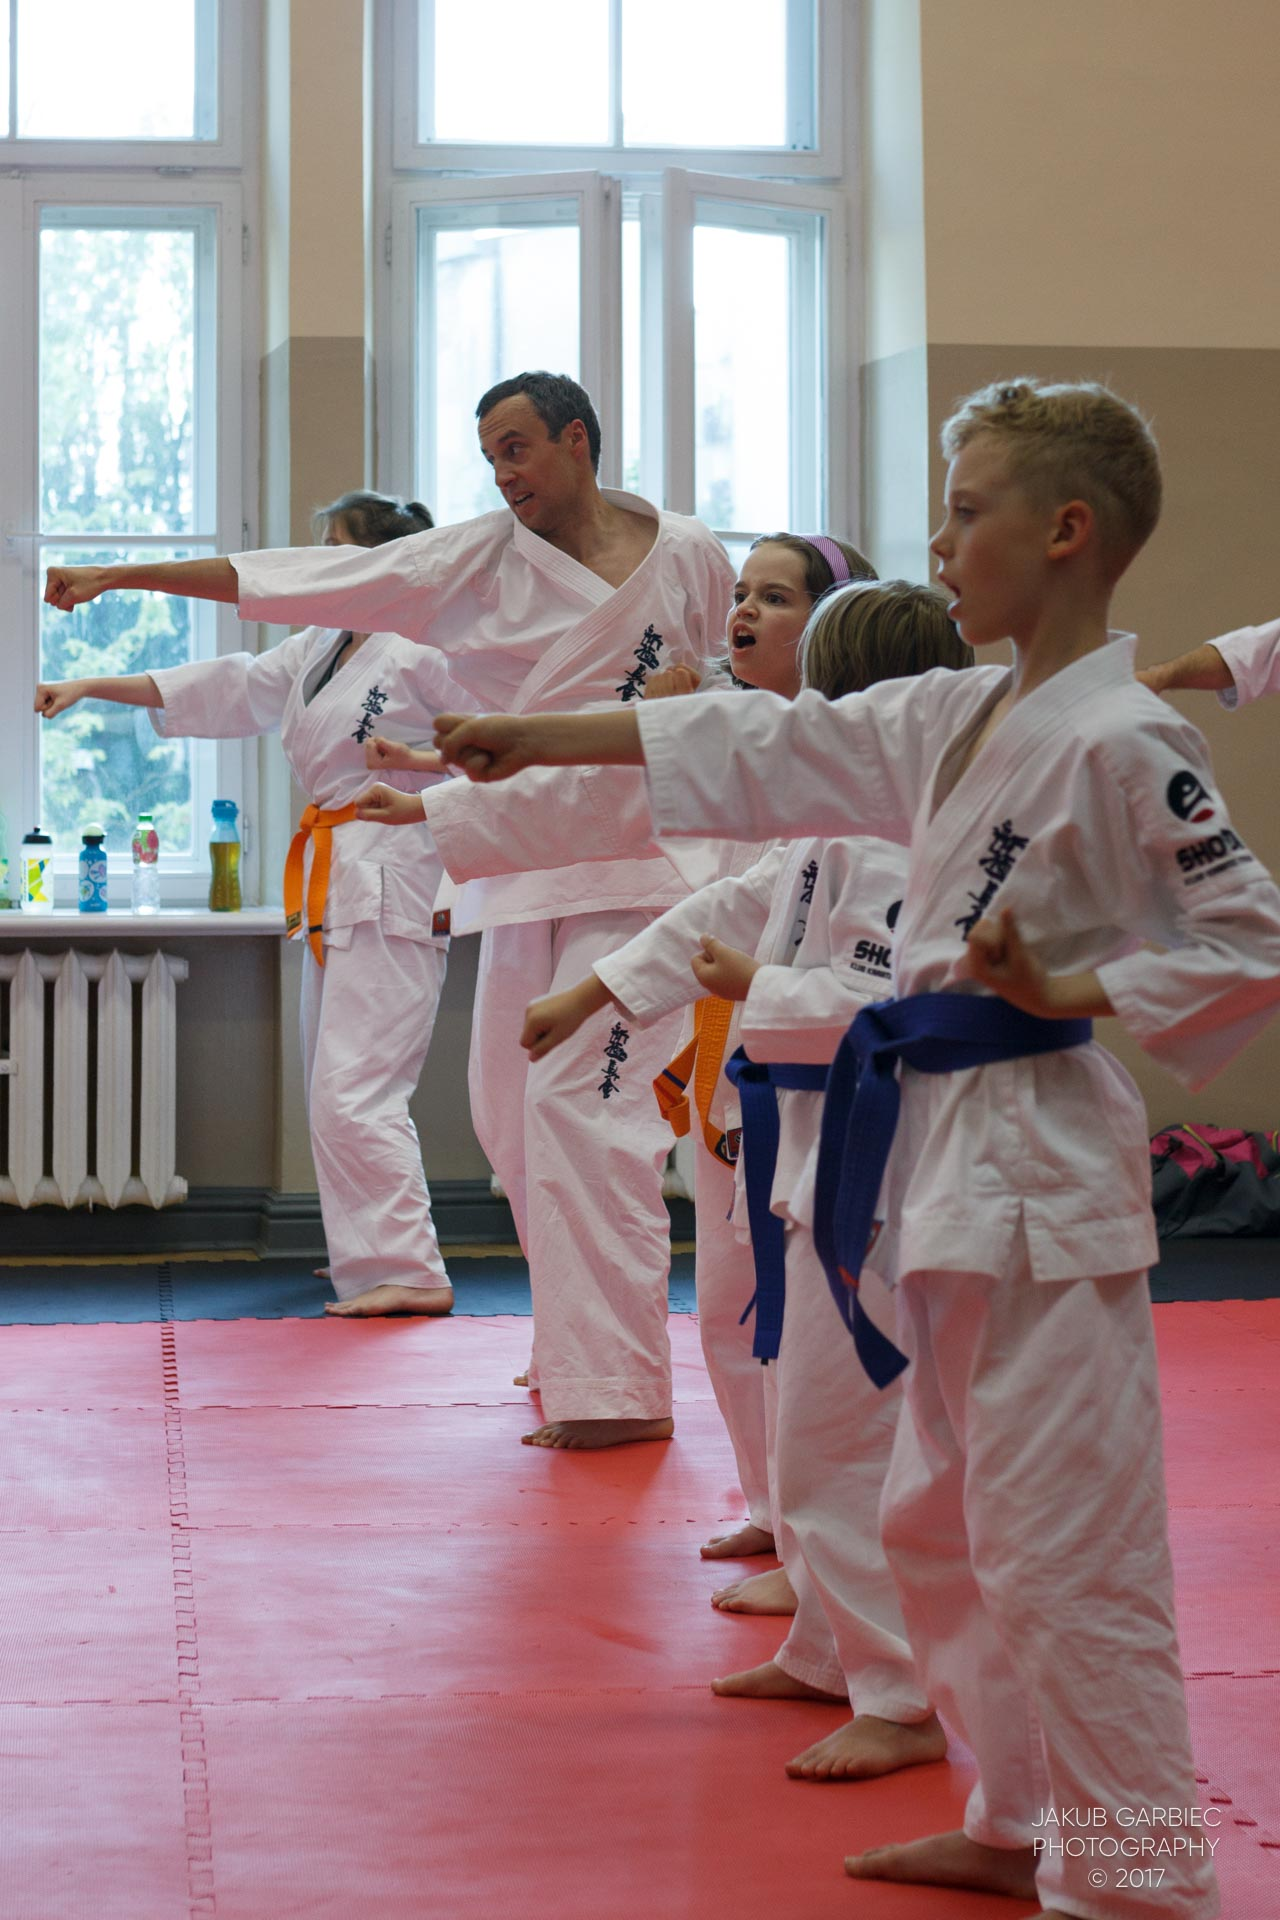 egzamin-karate-mistrz-mariusz-mazur-klub-karate-shodan-2017-06-02-16